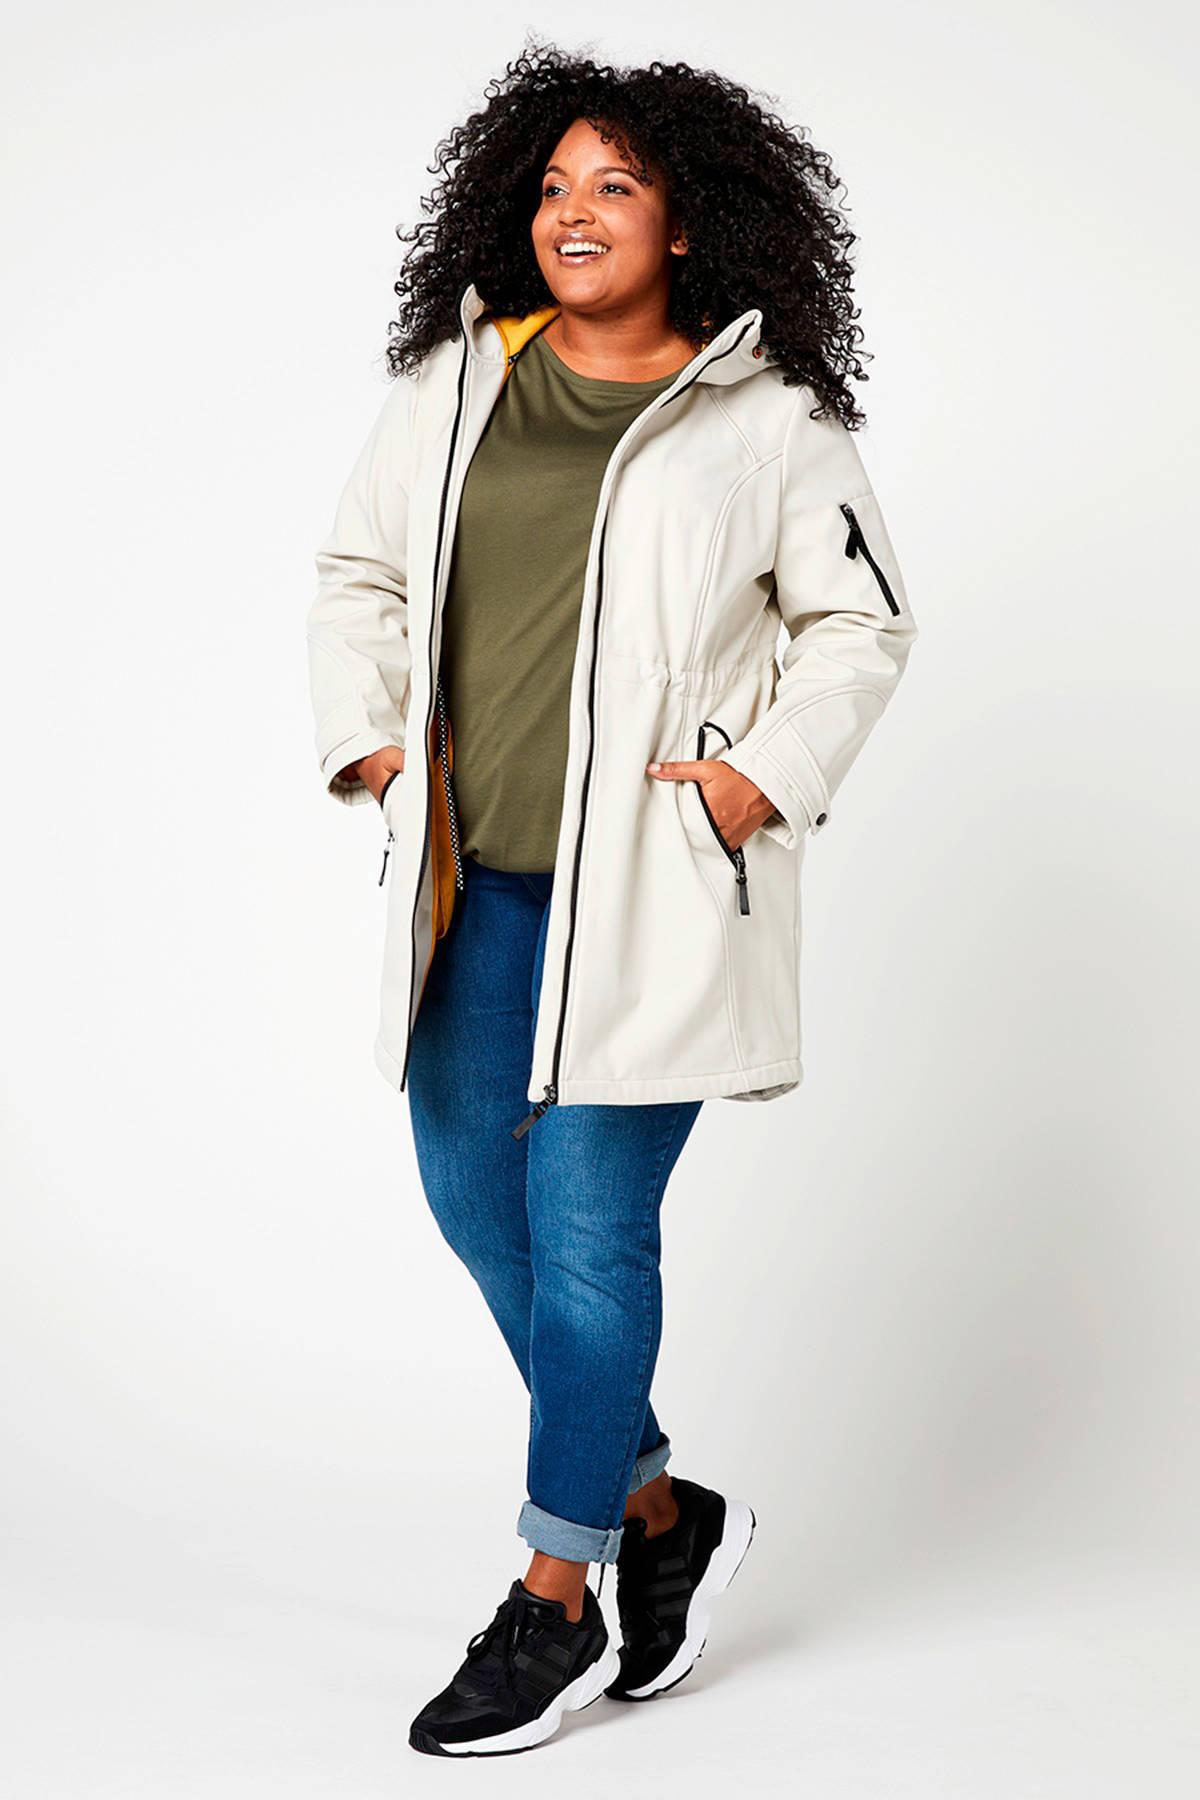 Regulier shoftshell jas wit